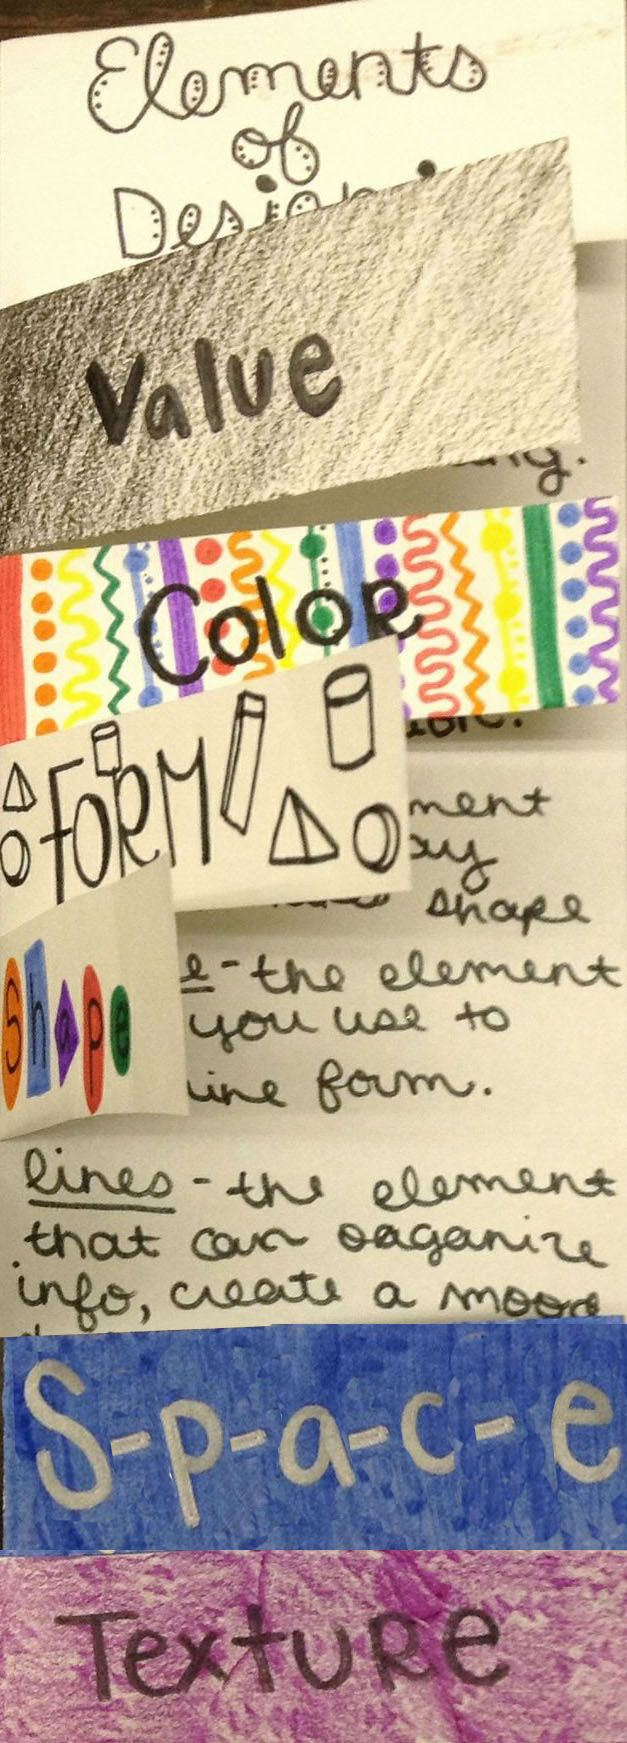 10 Elements Of Art : Images about elements of art flip chart on pinterest